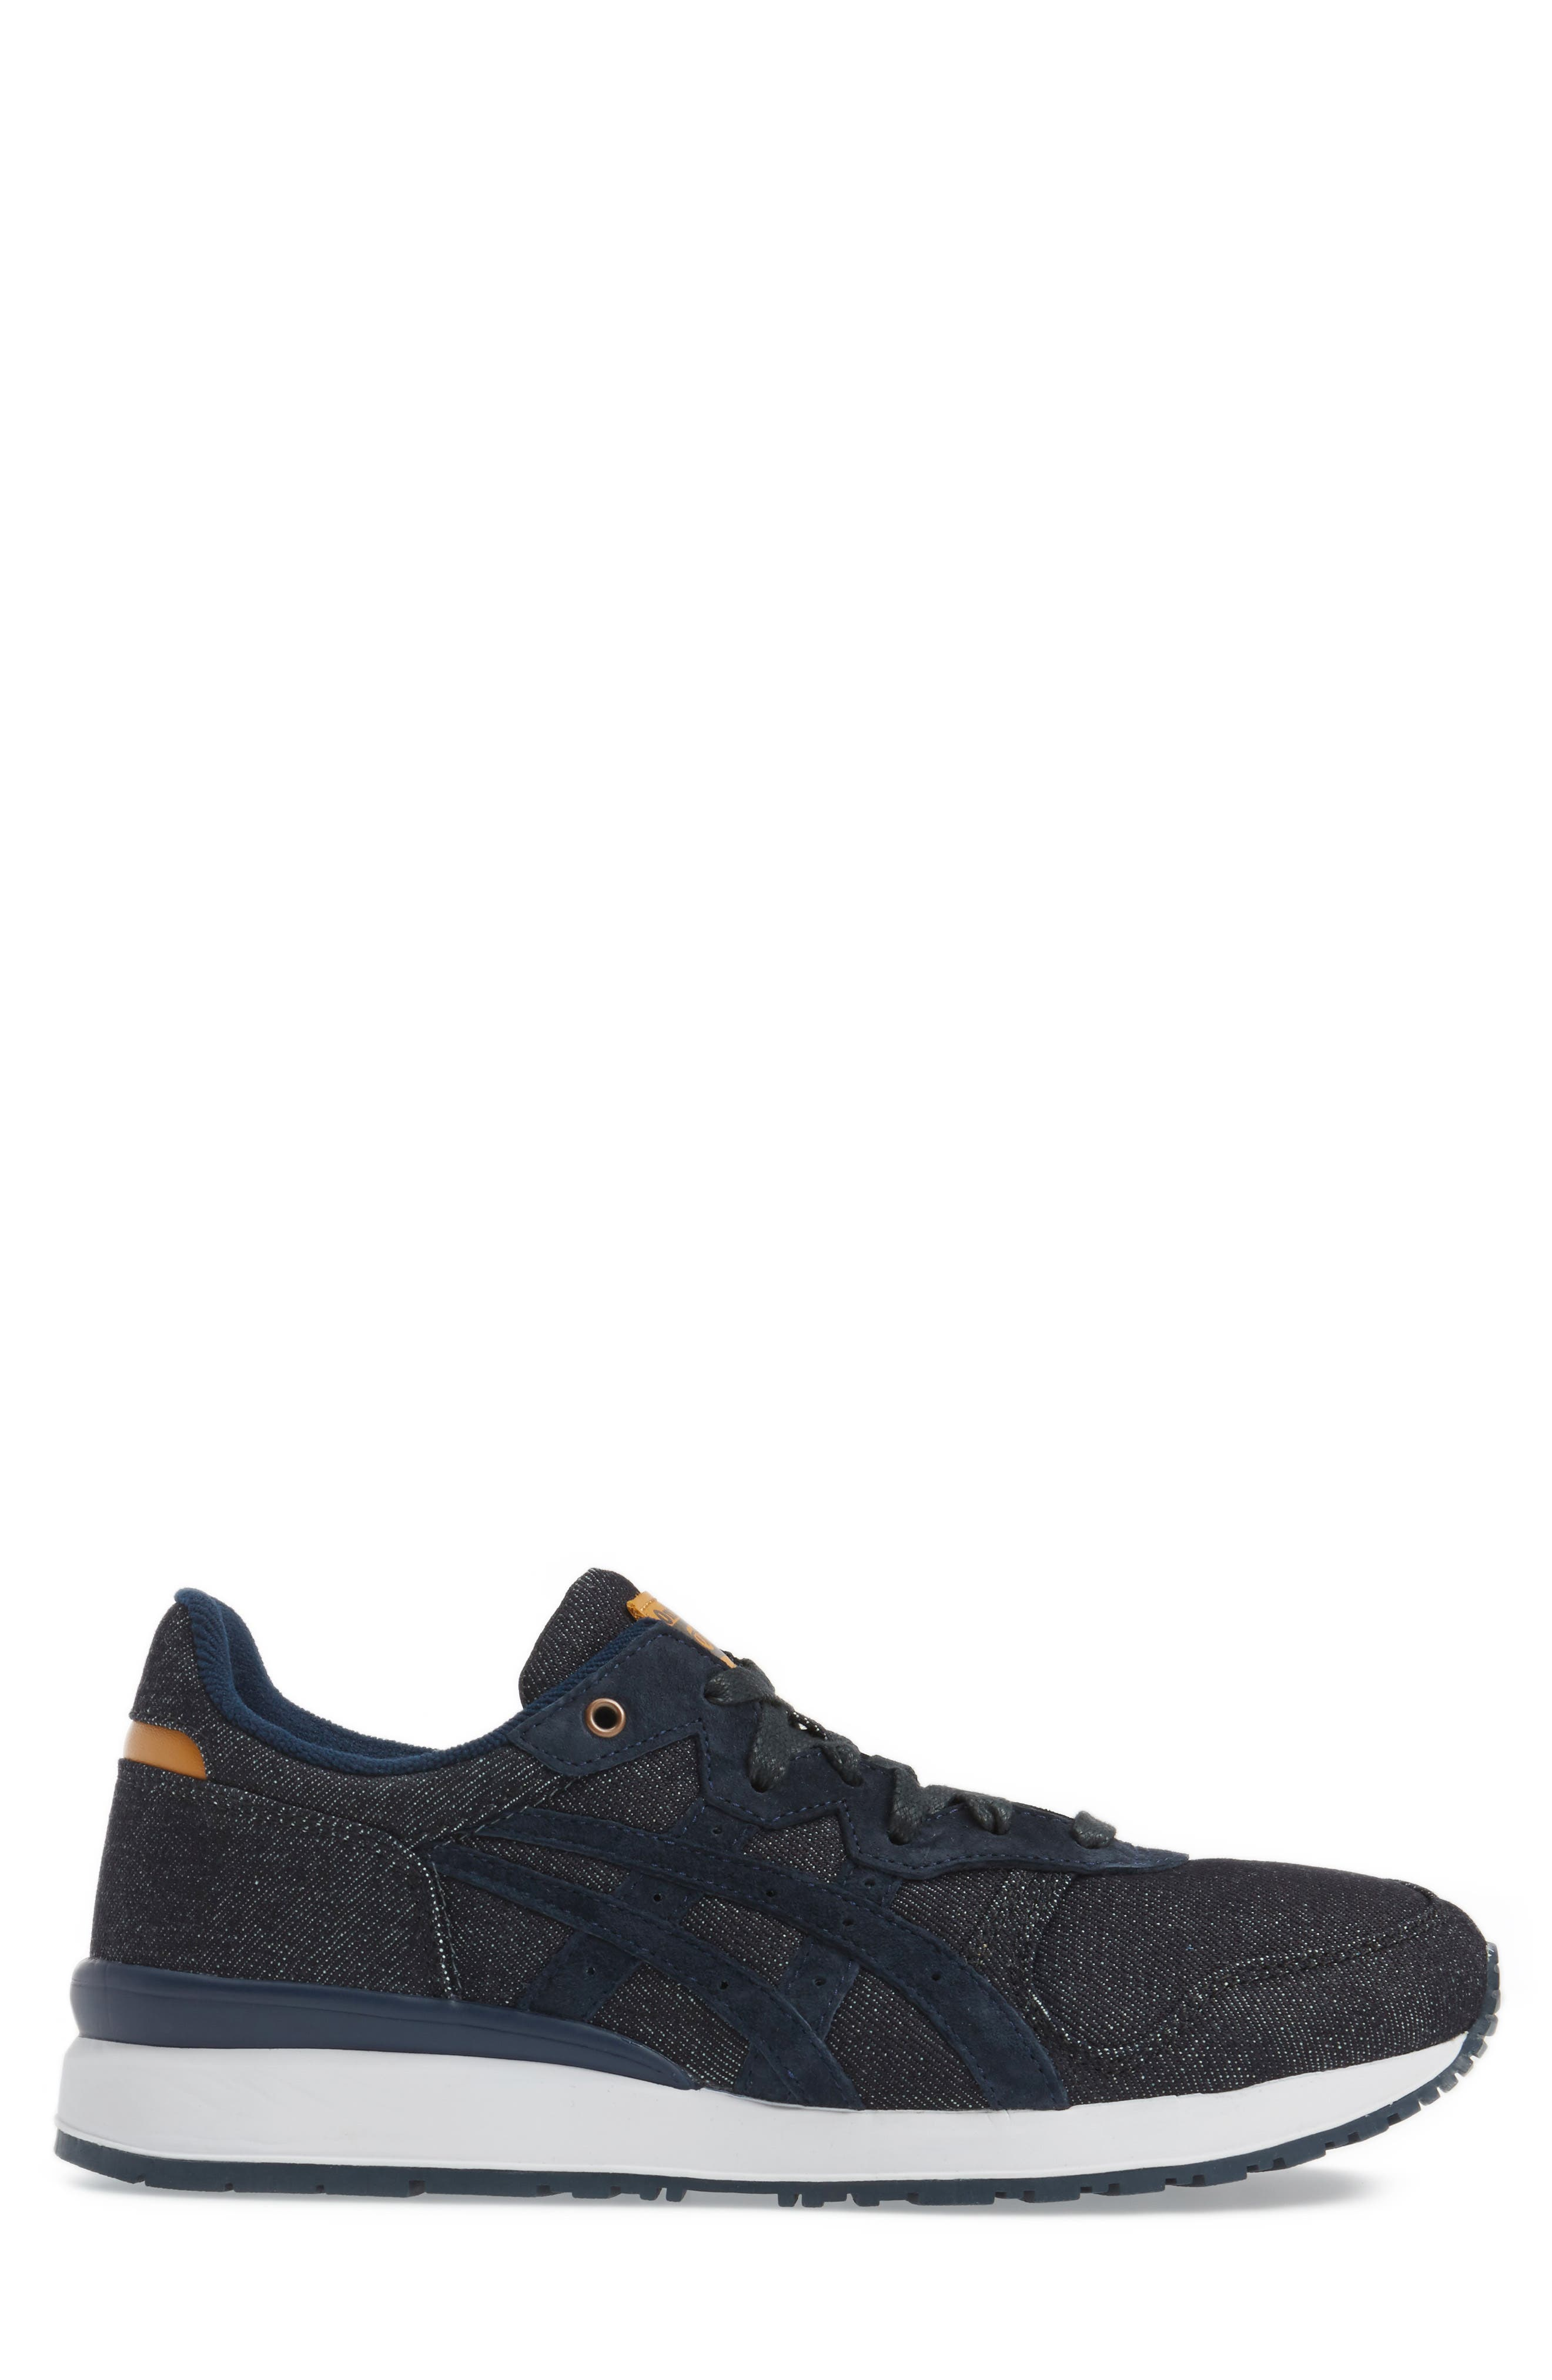 Onitsuka Tiger Ally Sneaker,                             Alternate thumbnail 3, color,                             410